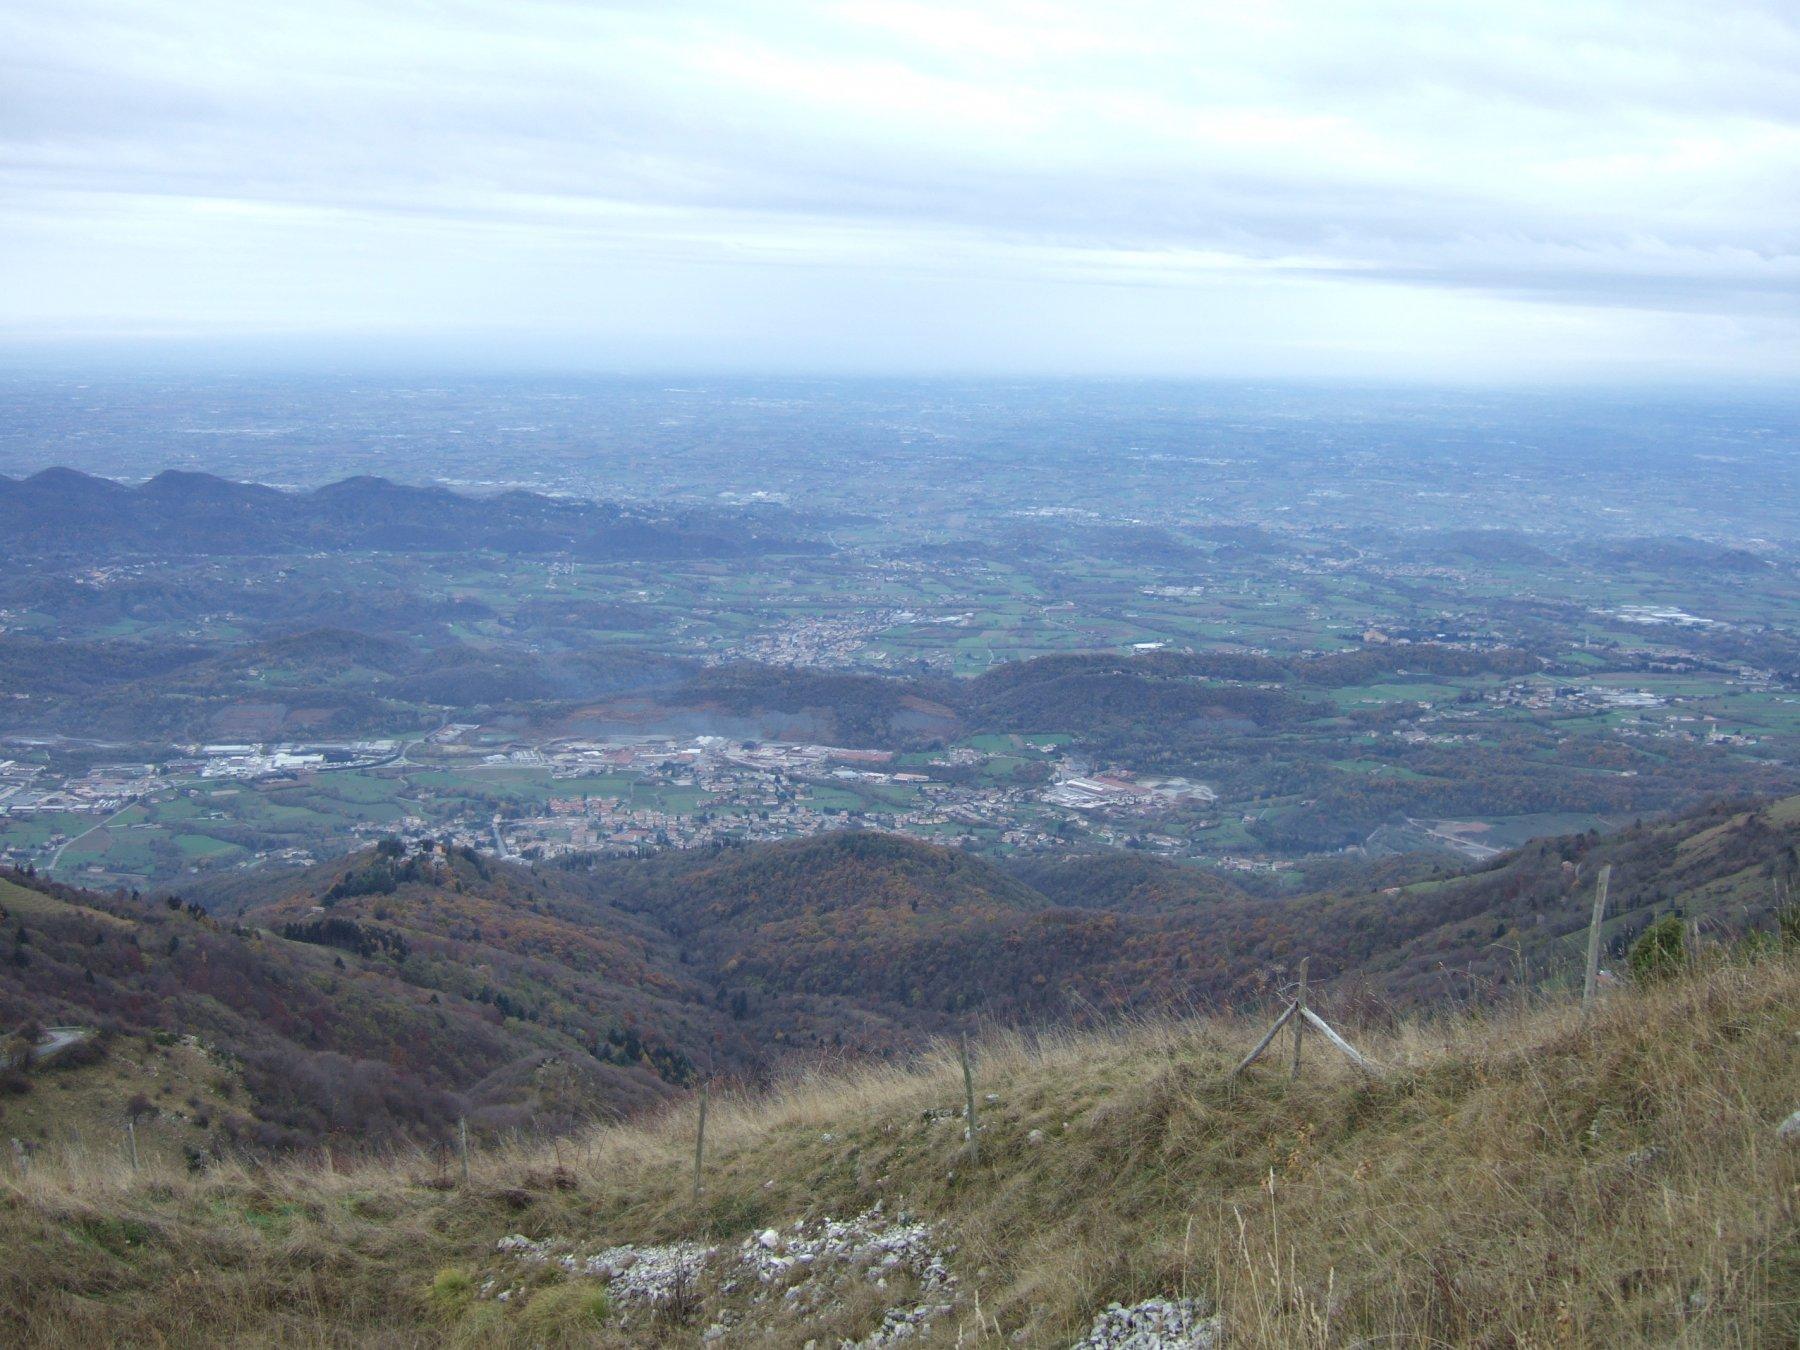 pianura trevigiana e fiume Piave dal Monte Palon